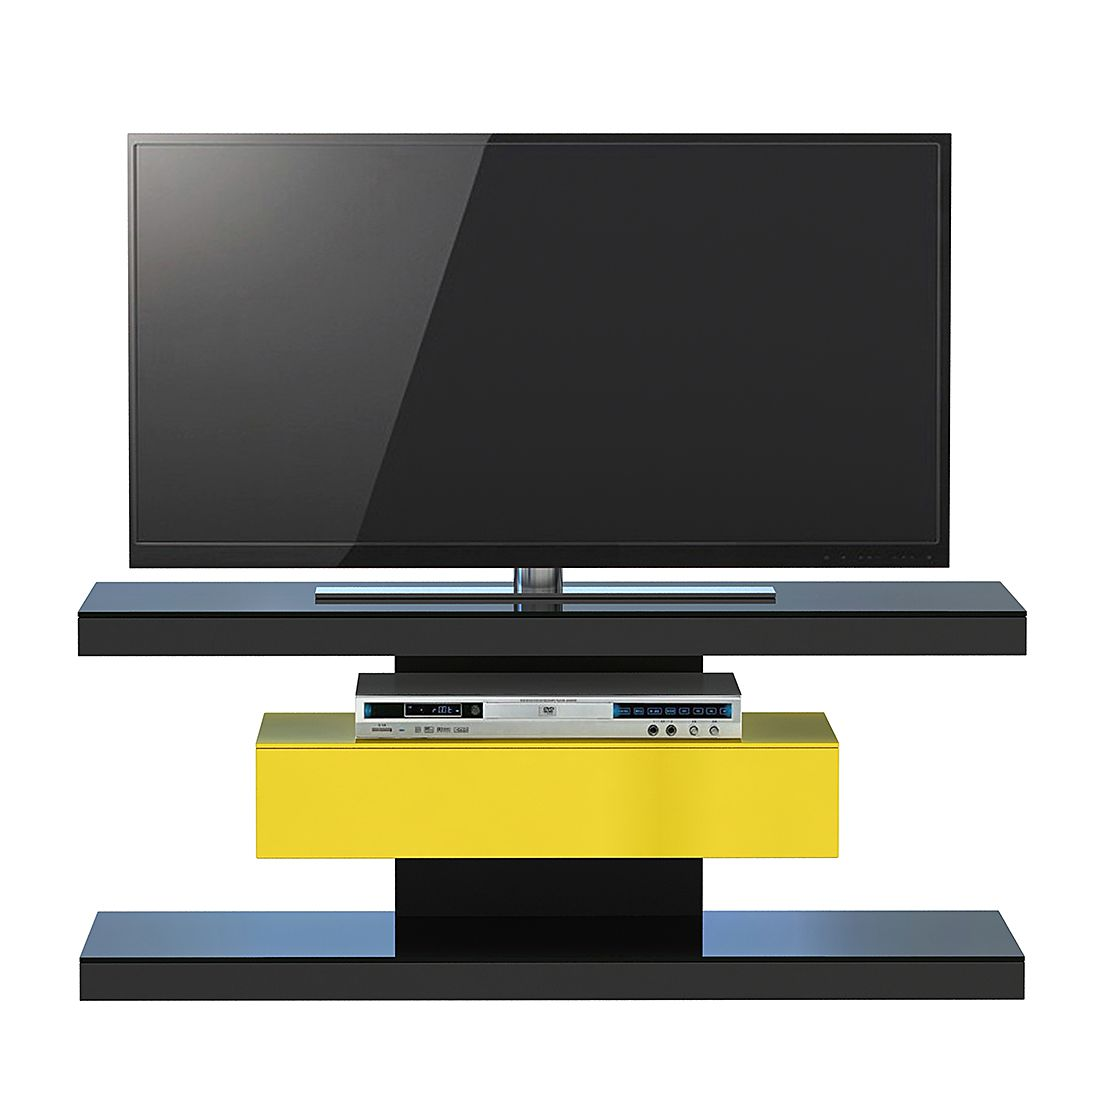 Schwarz Holz Tv Raks Online Kaufen Mobel Suchmaschine Ladendirekt De